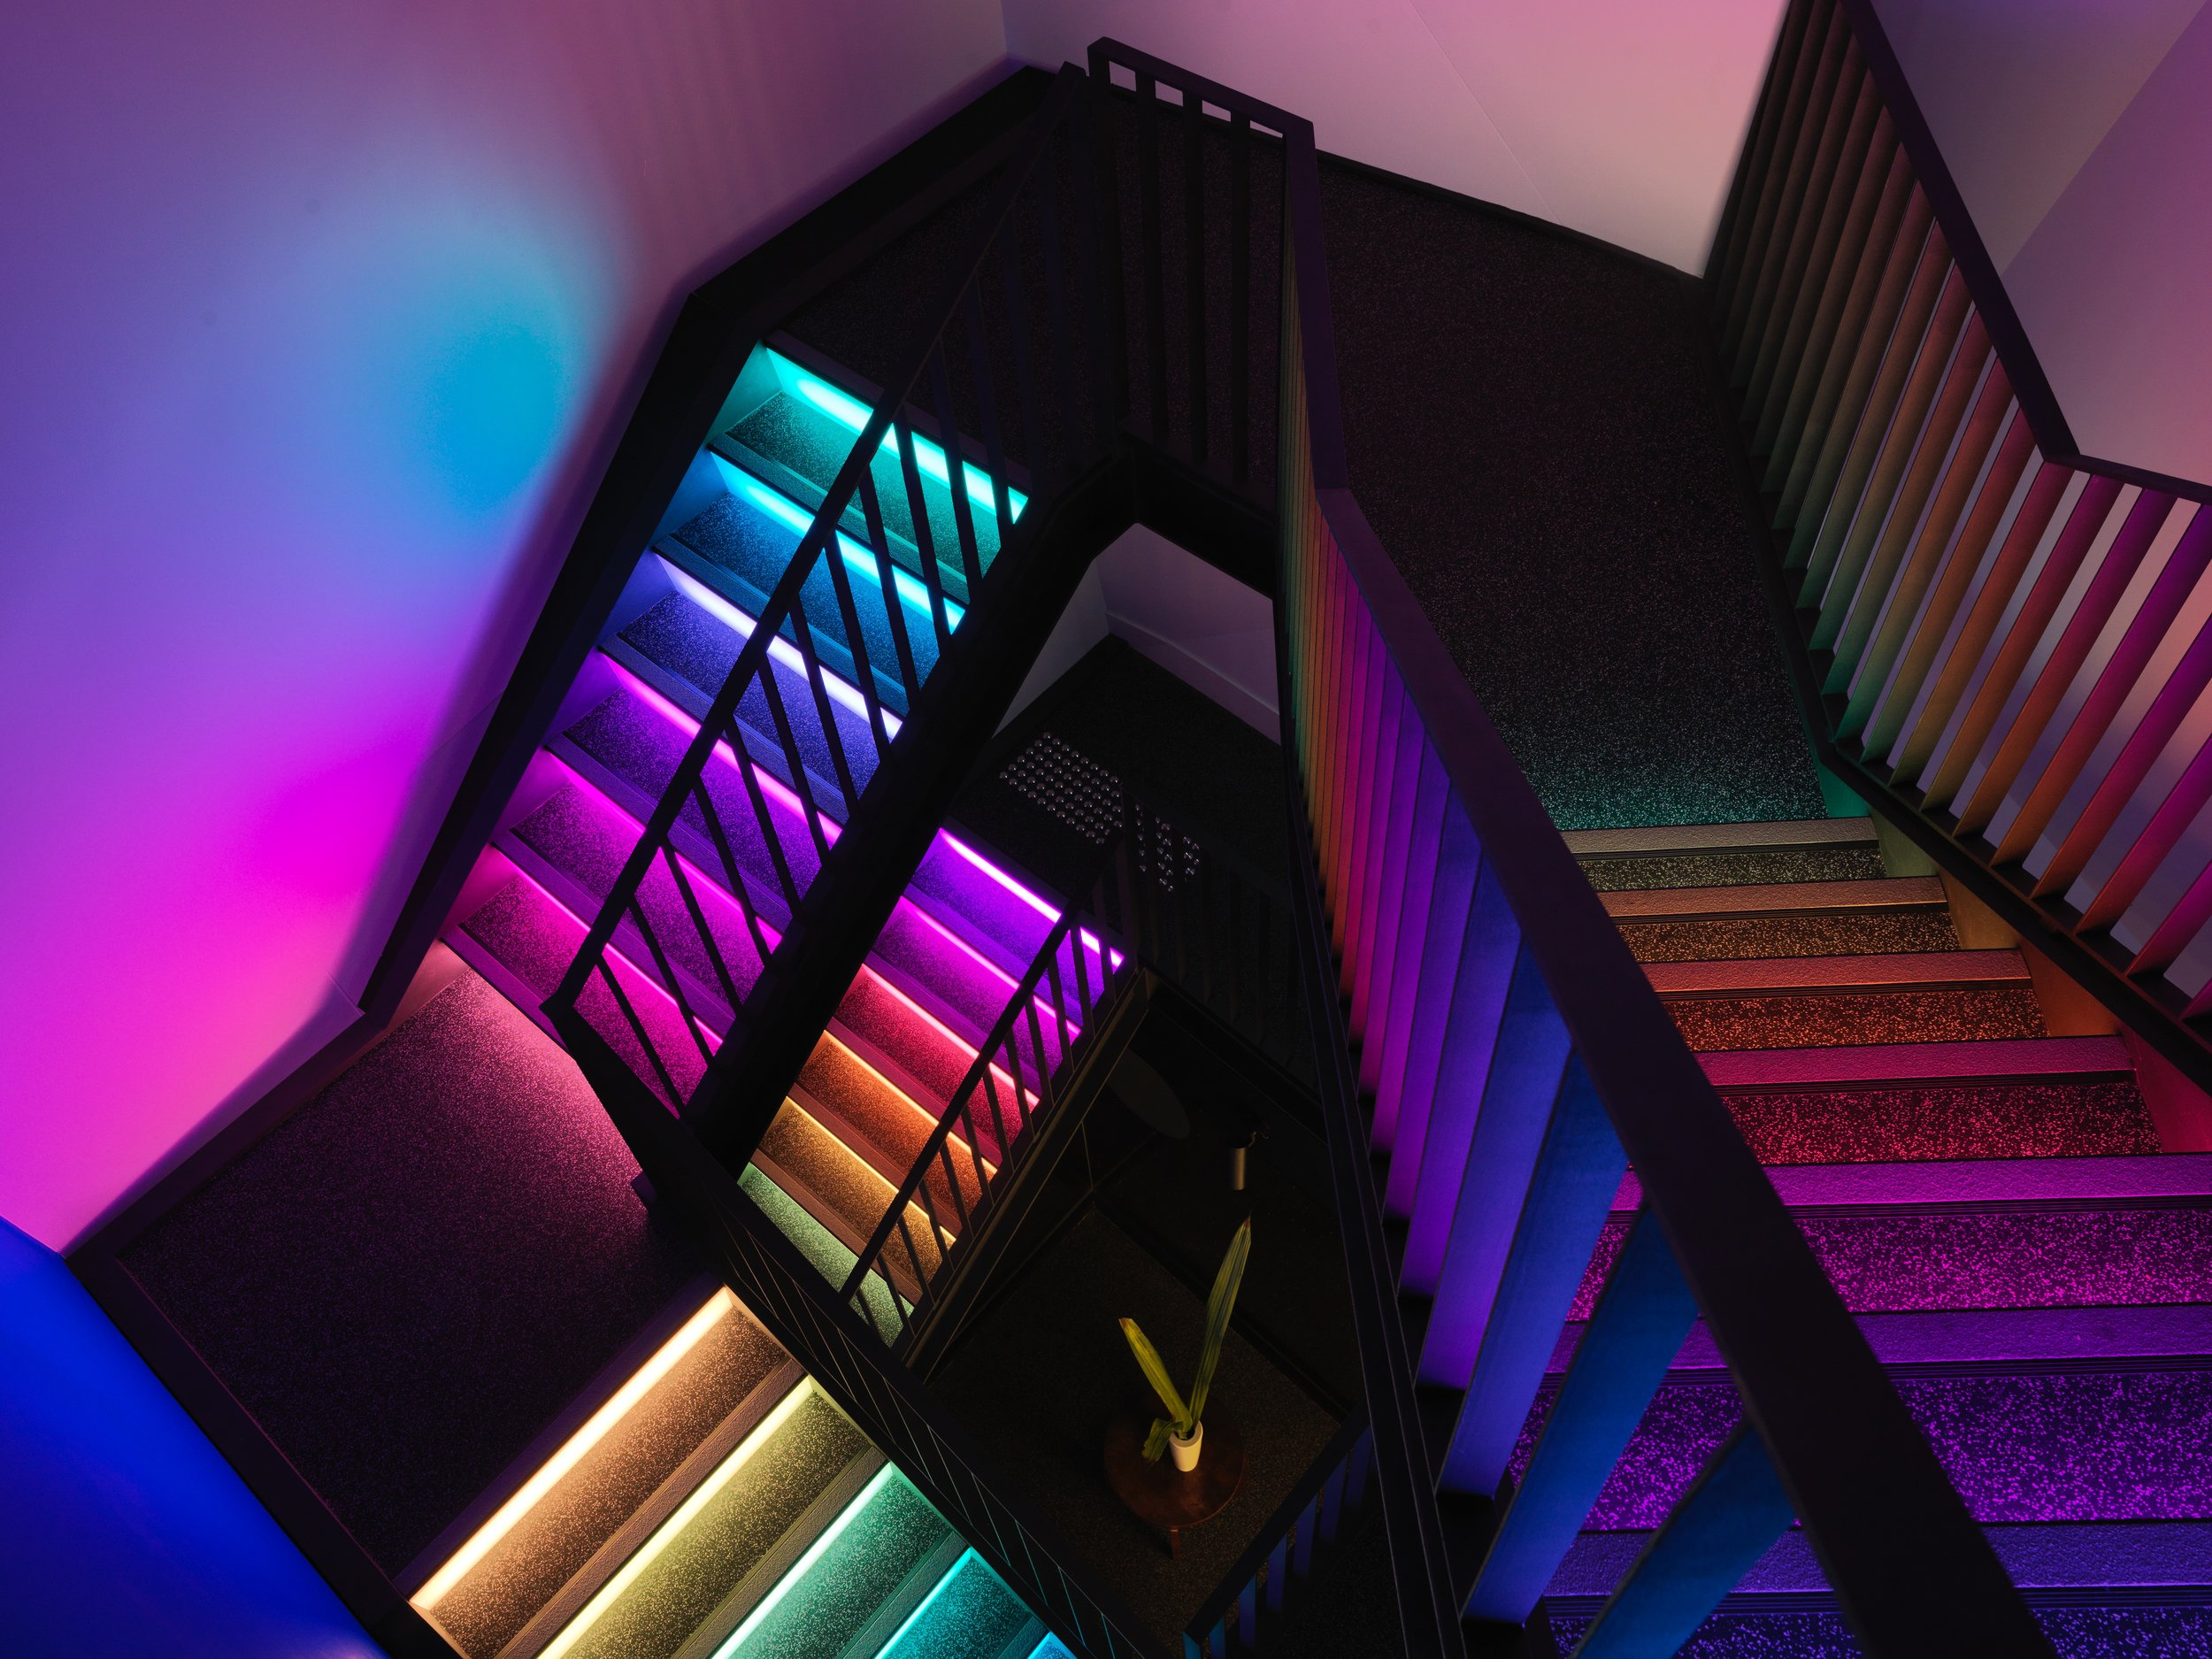 ilanel_JAHM_39 Interactive Steps-01.jpg